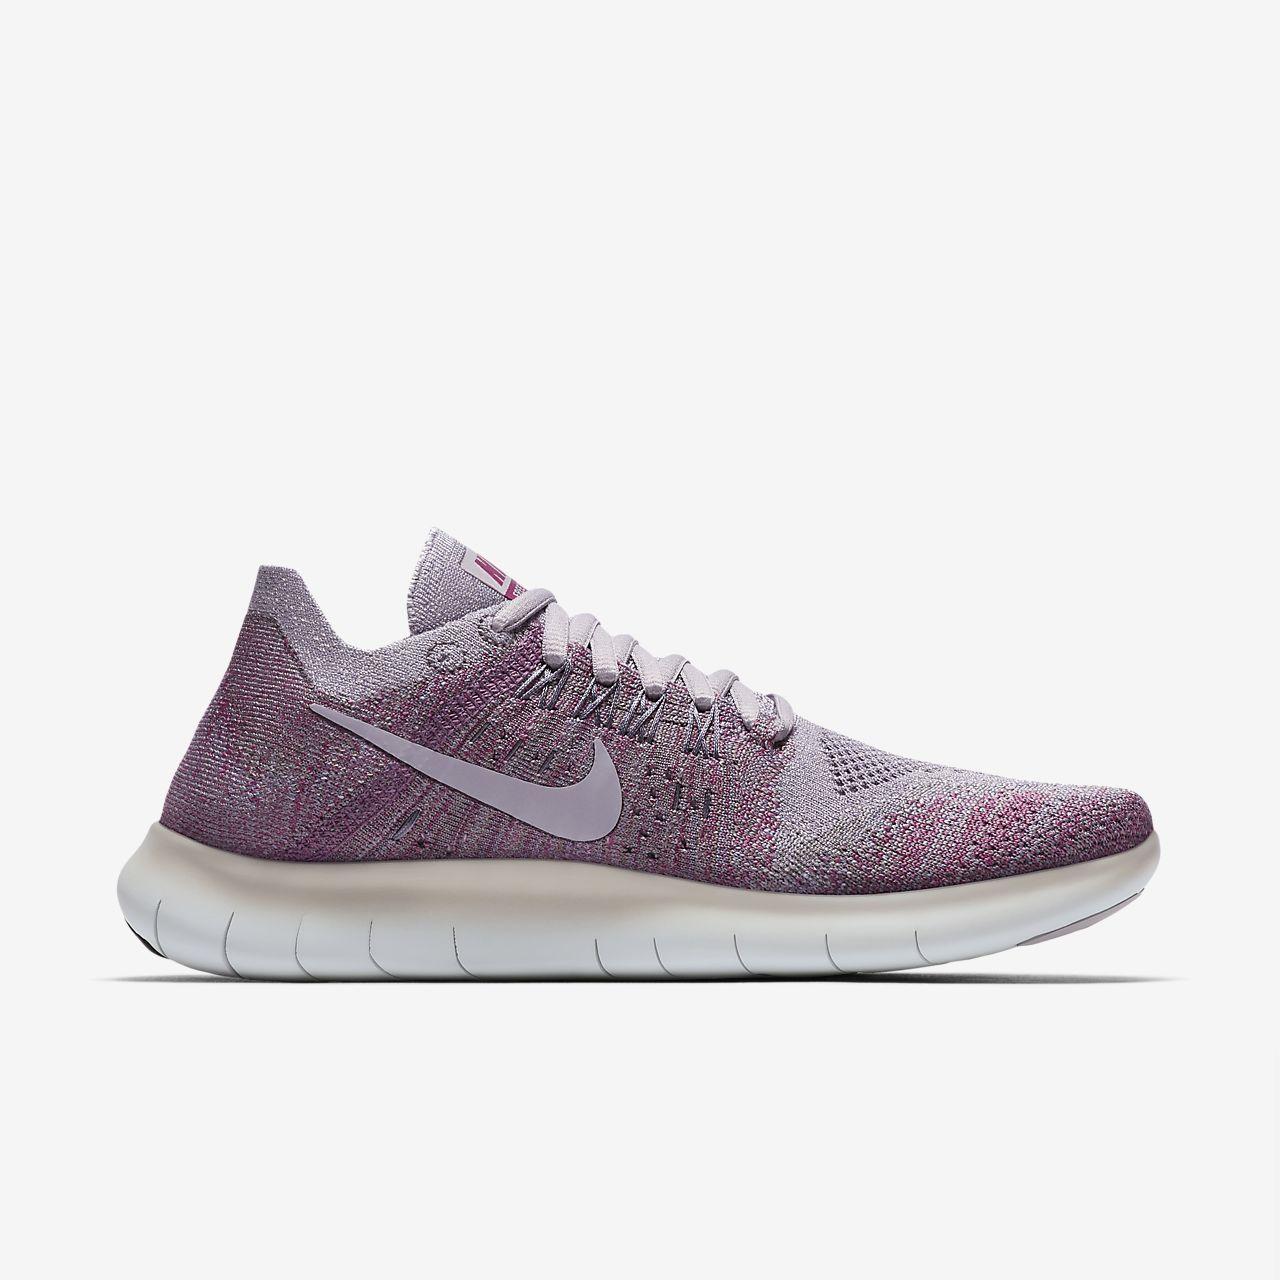 ... Nike Free RN Flyknit 2017 Women\u0027s Running Shoe